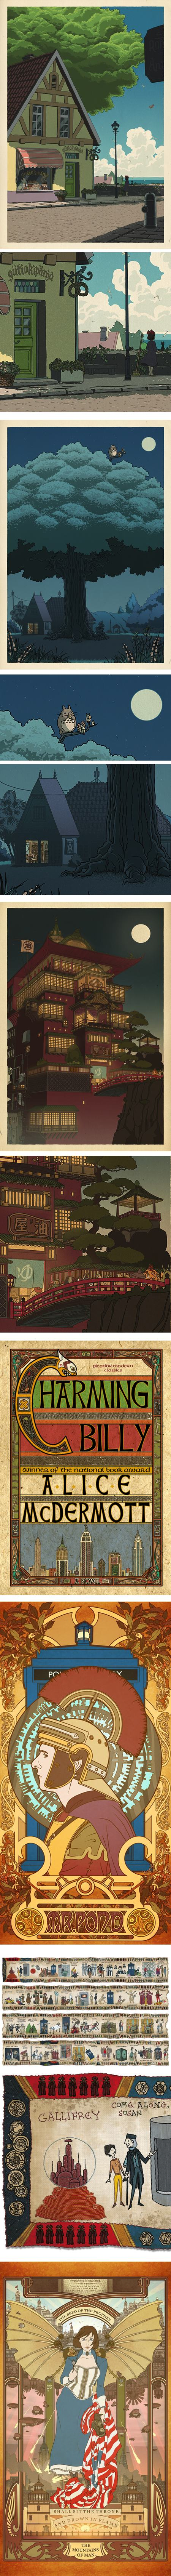 Bill Mudron, Miyazaki/Husi Dr. Who/Mucha prints